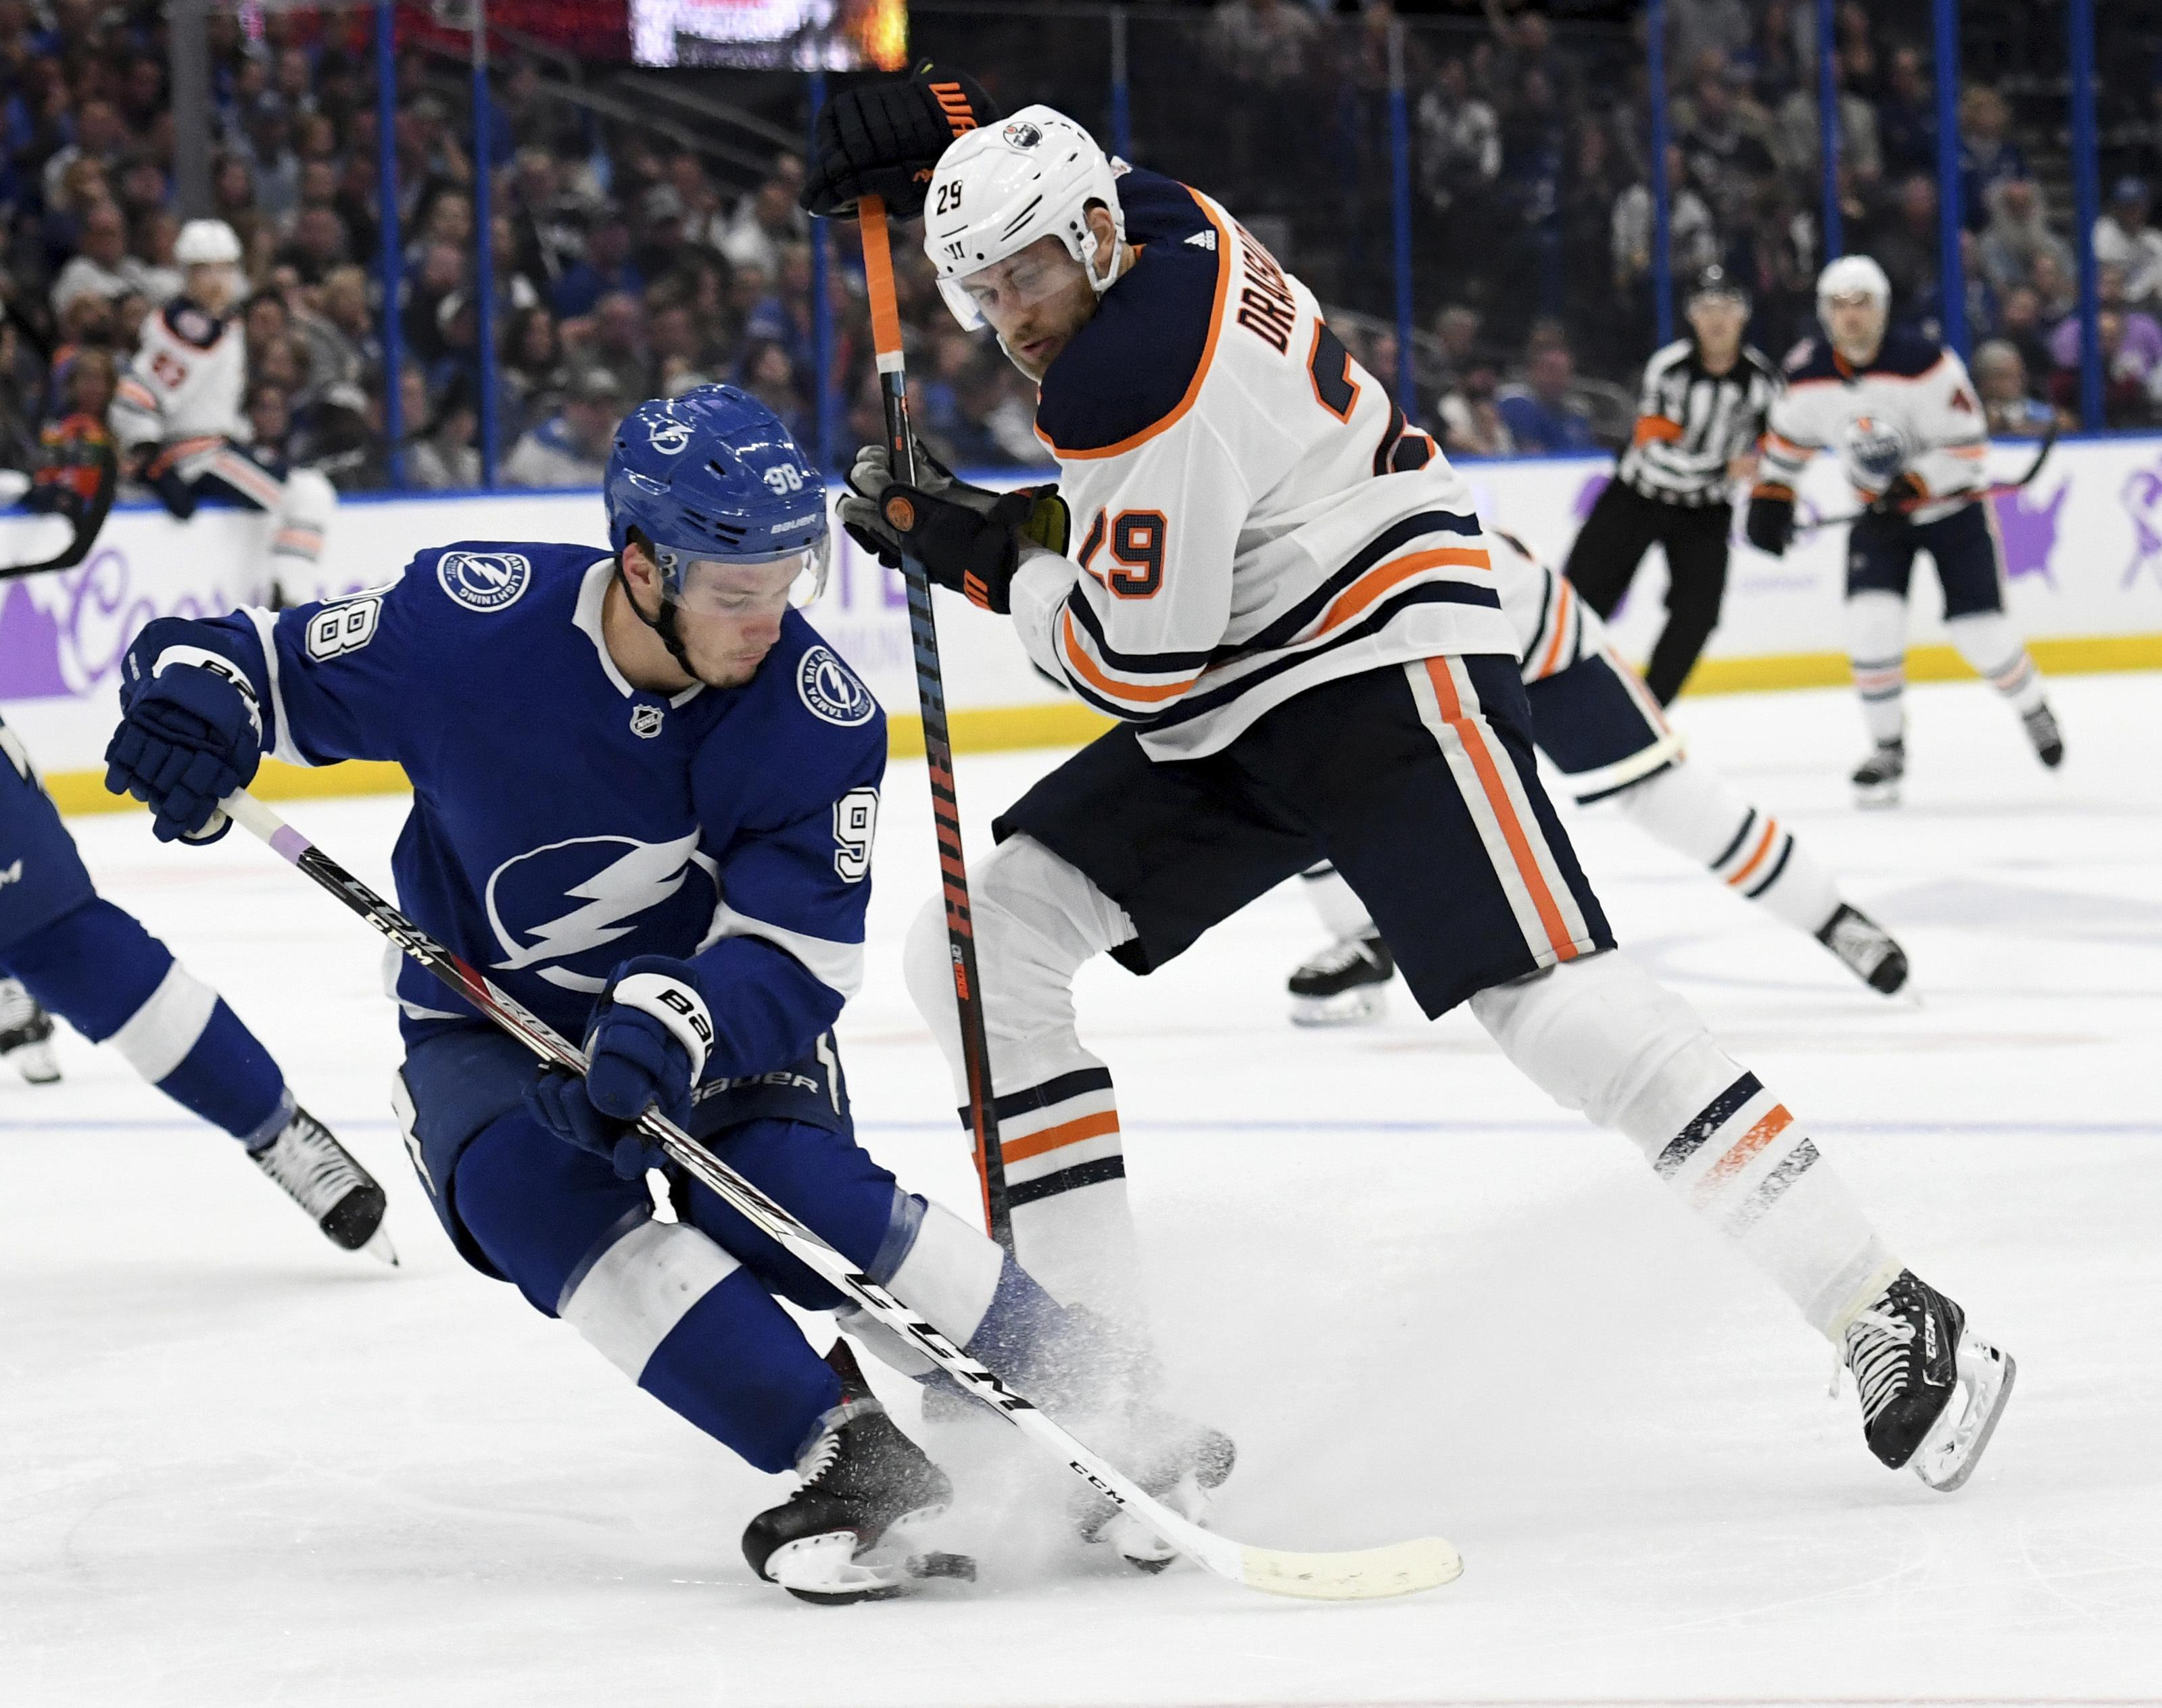 05e62952e5b Tampa Bay Lightning defenseman Mikhail Sergachev takes the puck from  Edmonton Oilers center Leon Draisaitl during